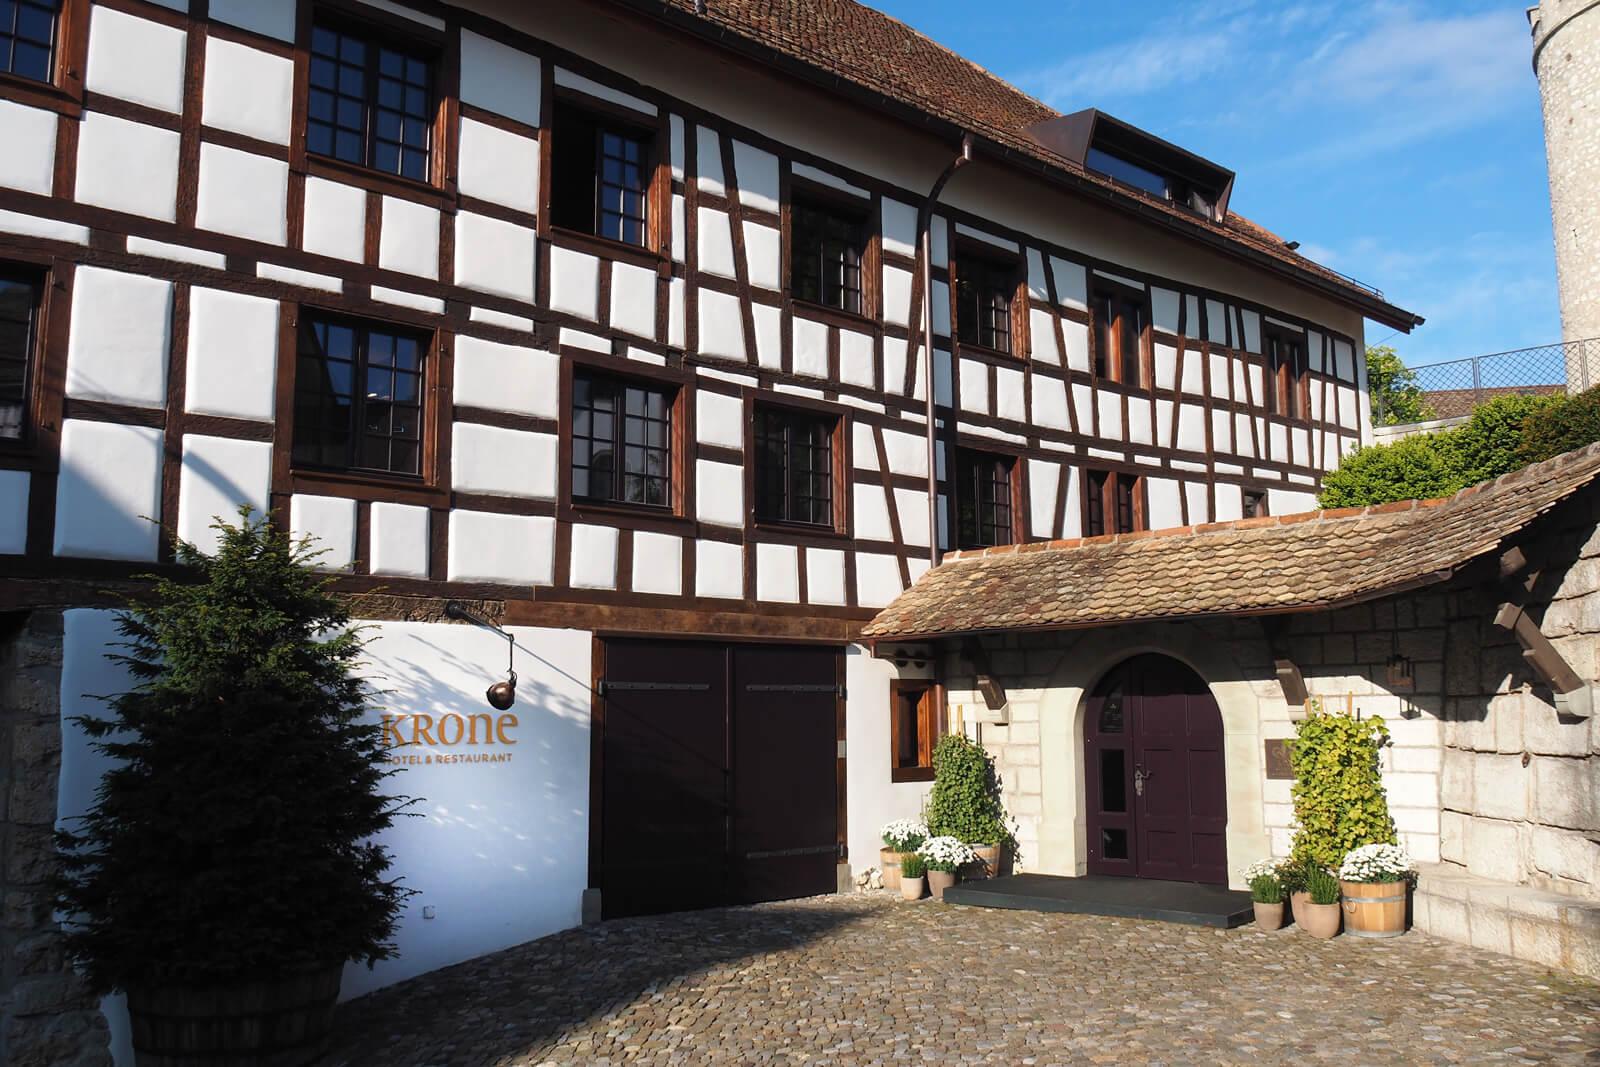 Hotel Krone Regensberg Relais & Châteaux